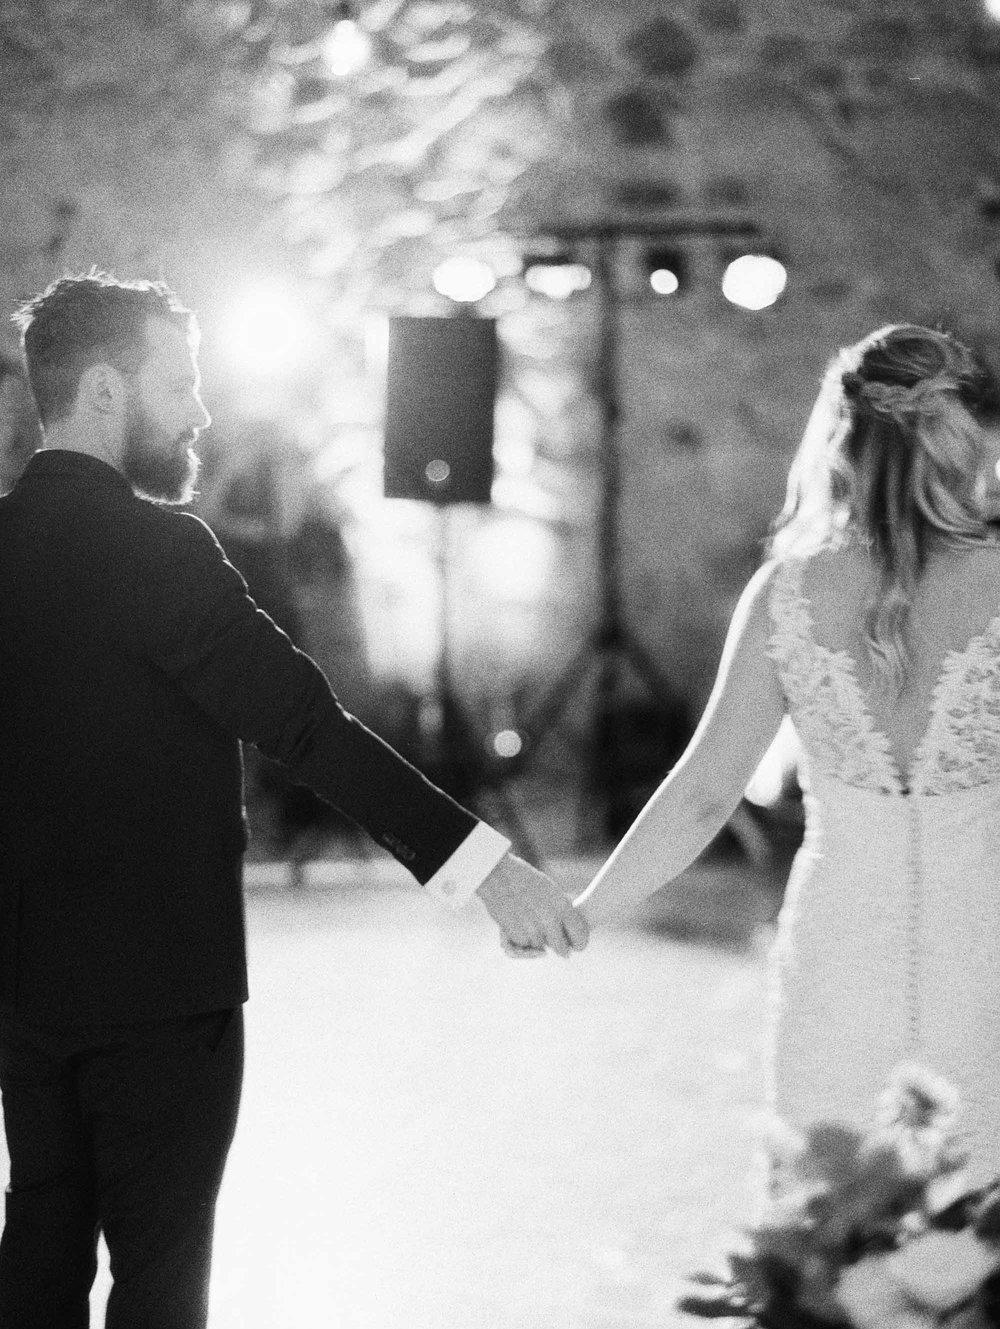 Golding-Wines-wedding-photography-128.jpg